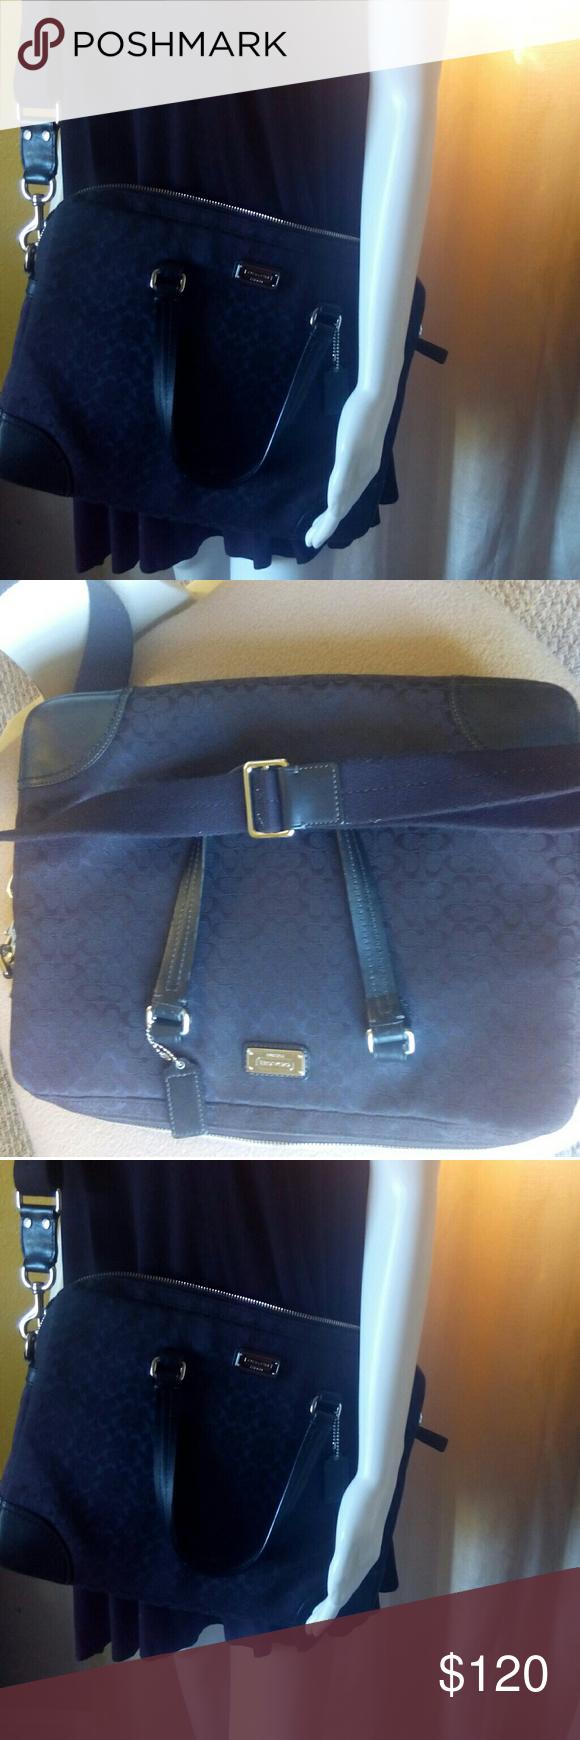 Black Coach Messenger Bag Like New Lightly Used Bags